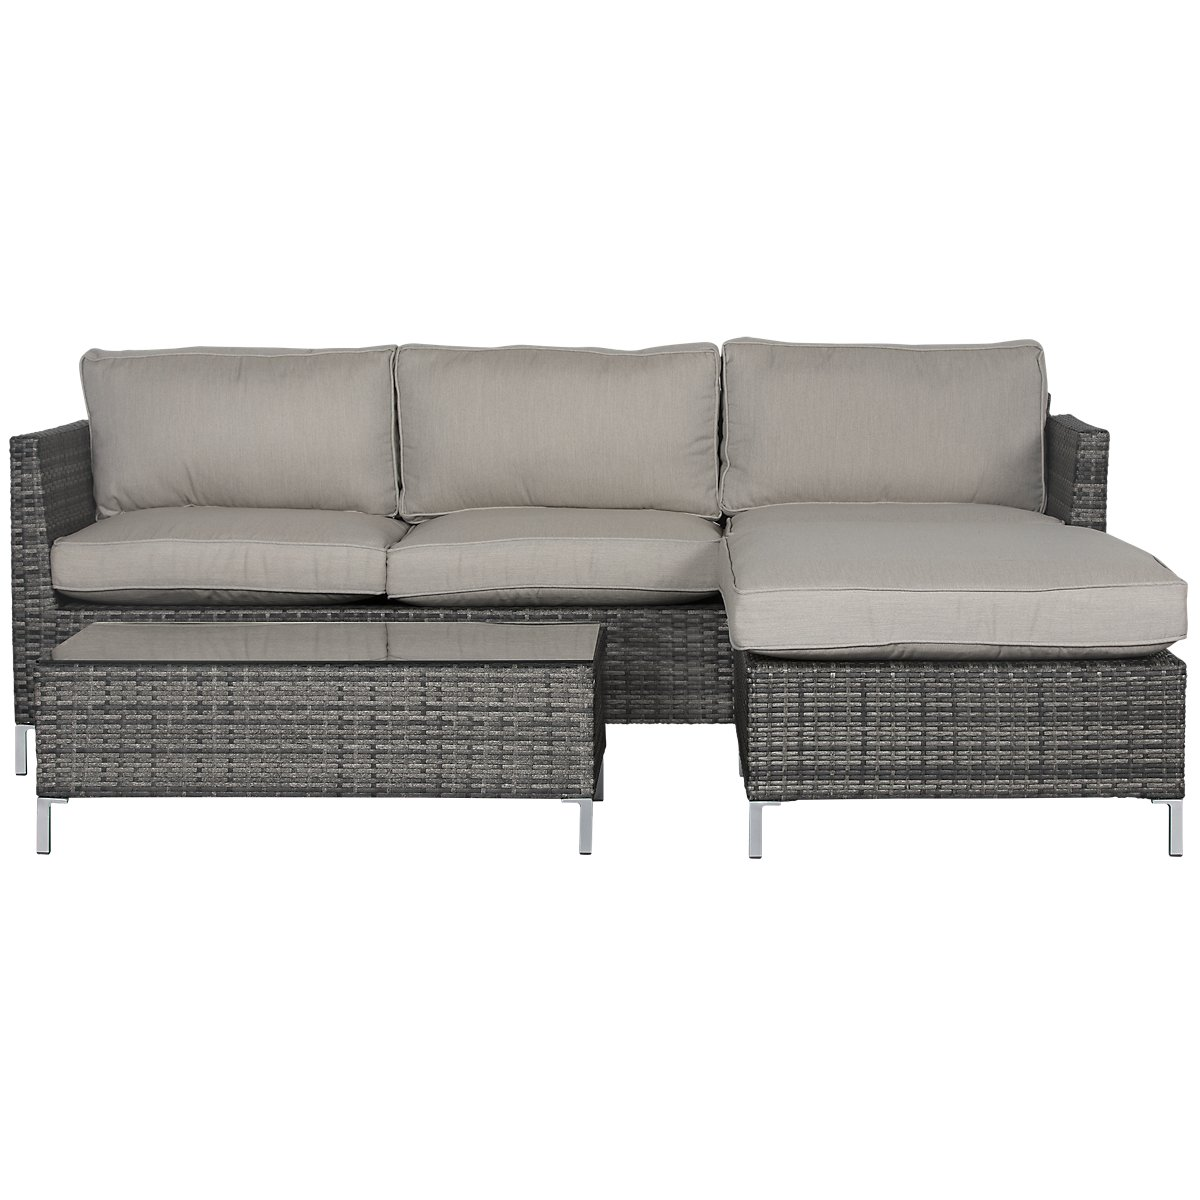 City Furniture: Monterey Gray Outdoor Living Room Set on Patio Living Room Set id=73867